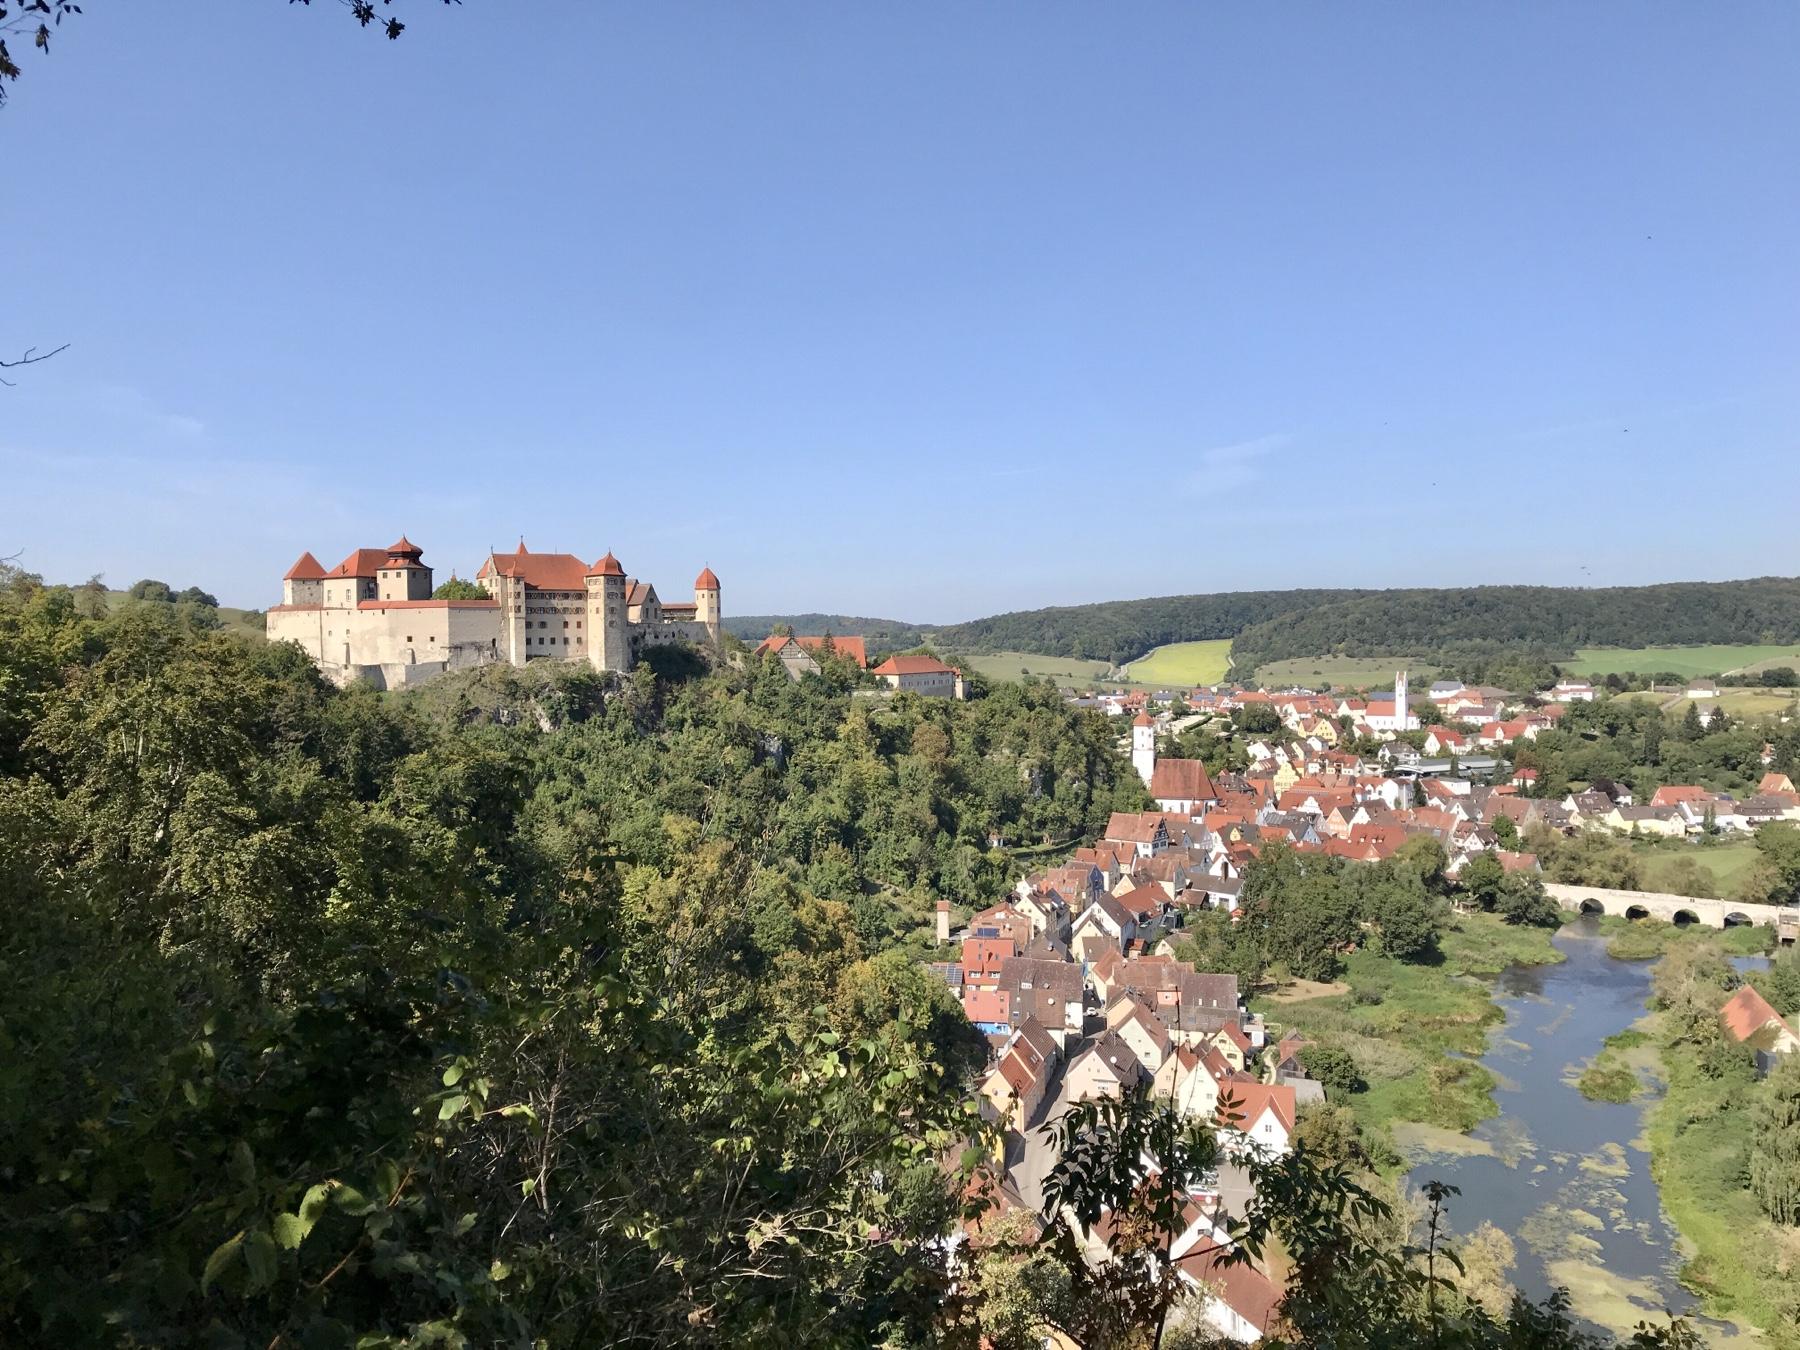 Panoramablick auf Harburg, Albsteig HW1, Etappe Harburg Mönchsdeggingen